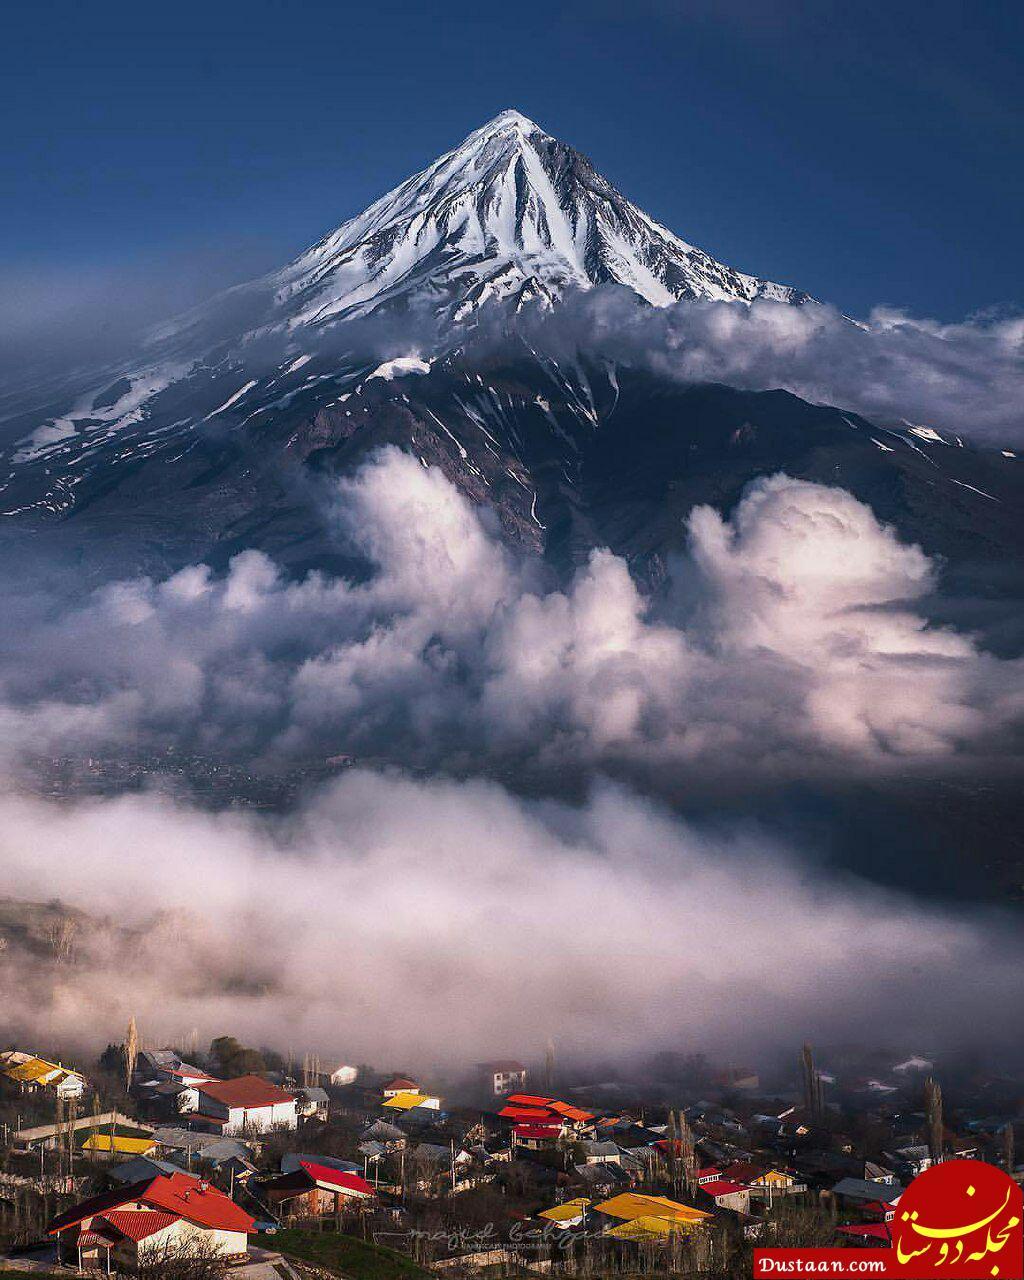 www.dustaan.com عکسی زیبا و کم نظیر از قله کوه آتشفشانی دماوند